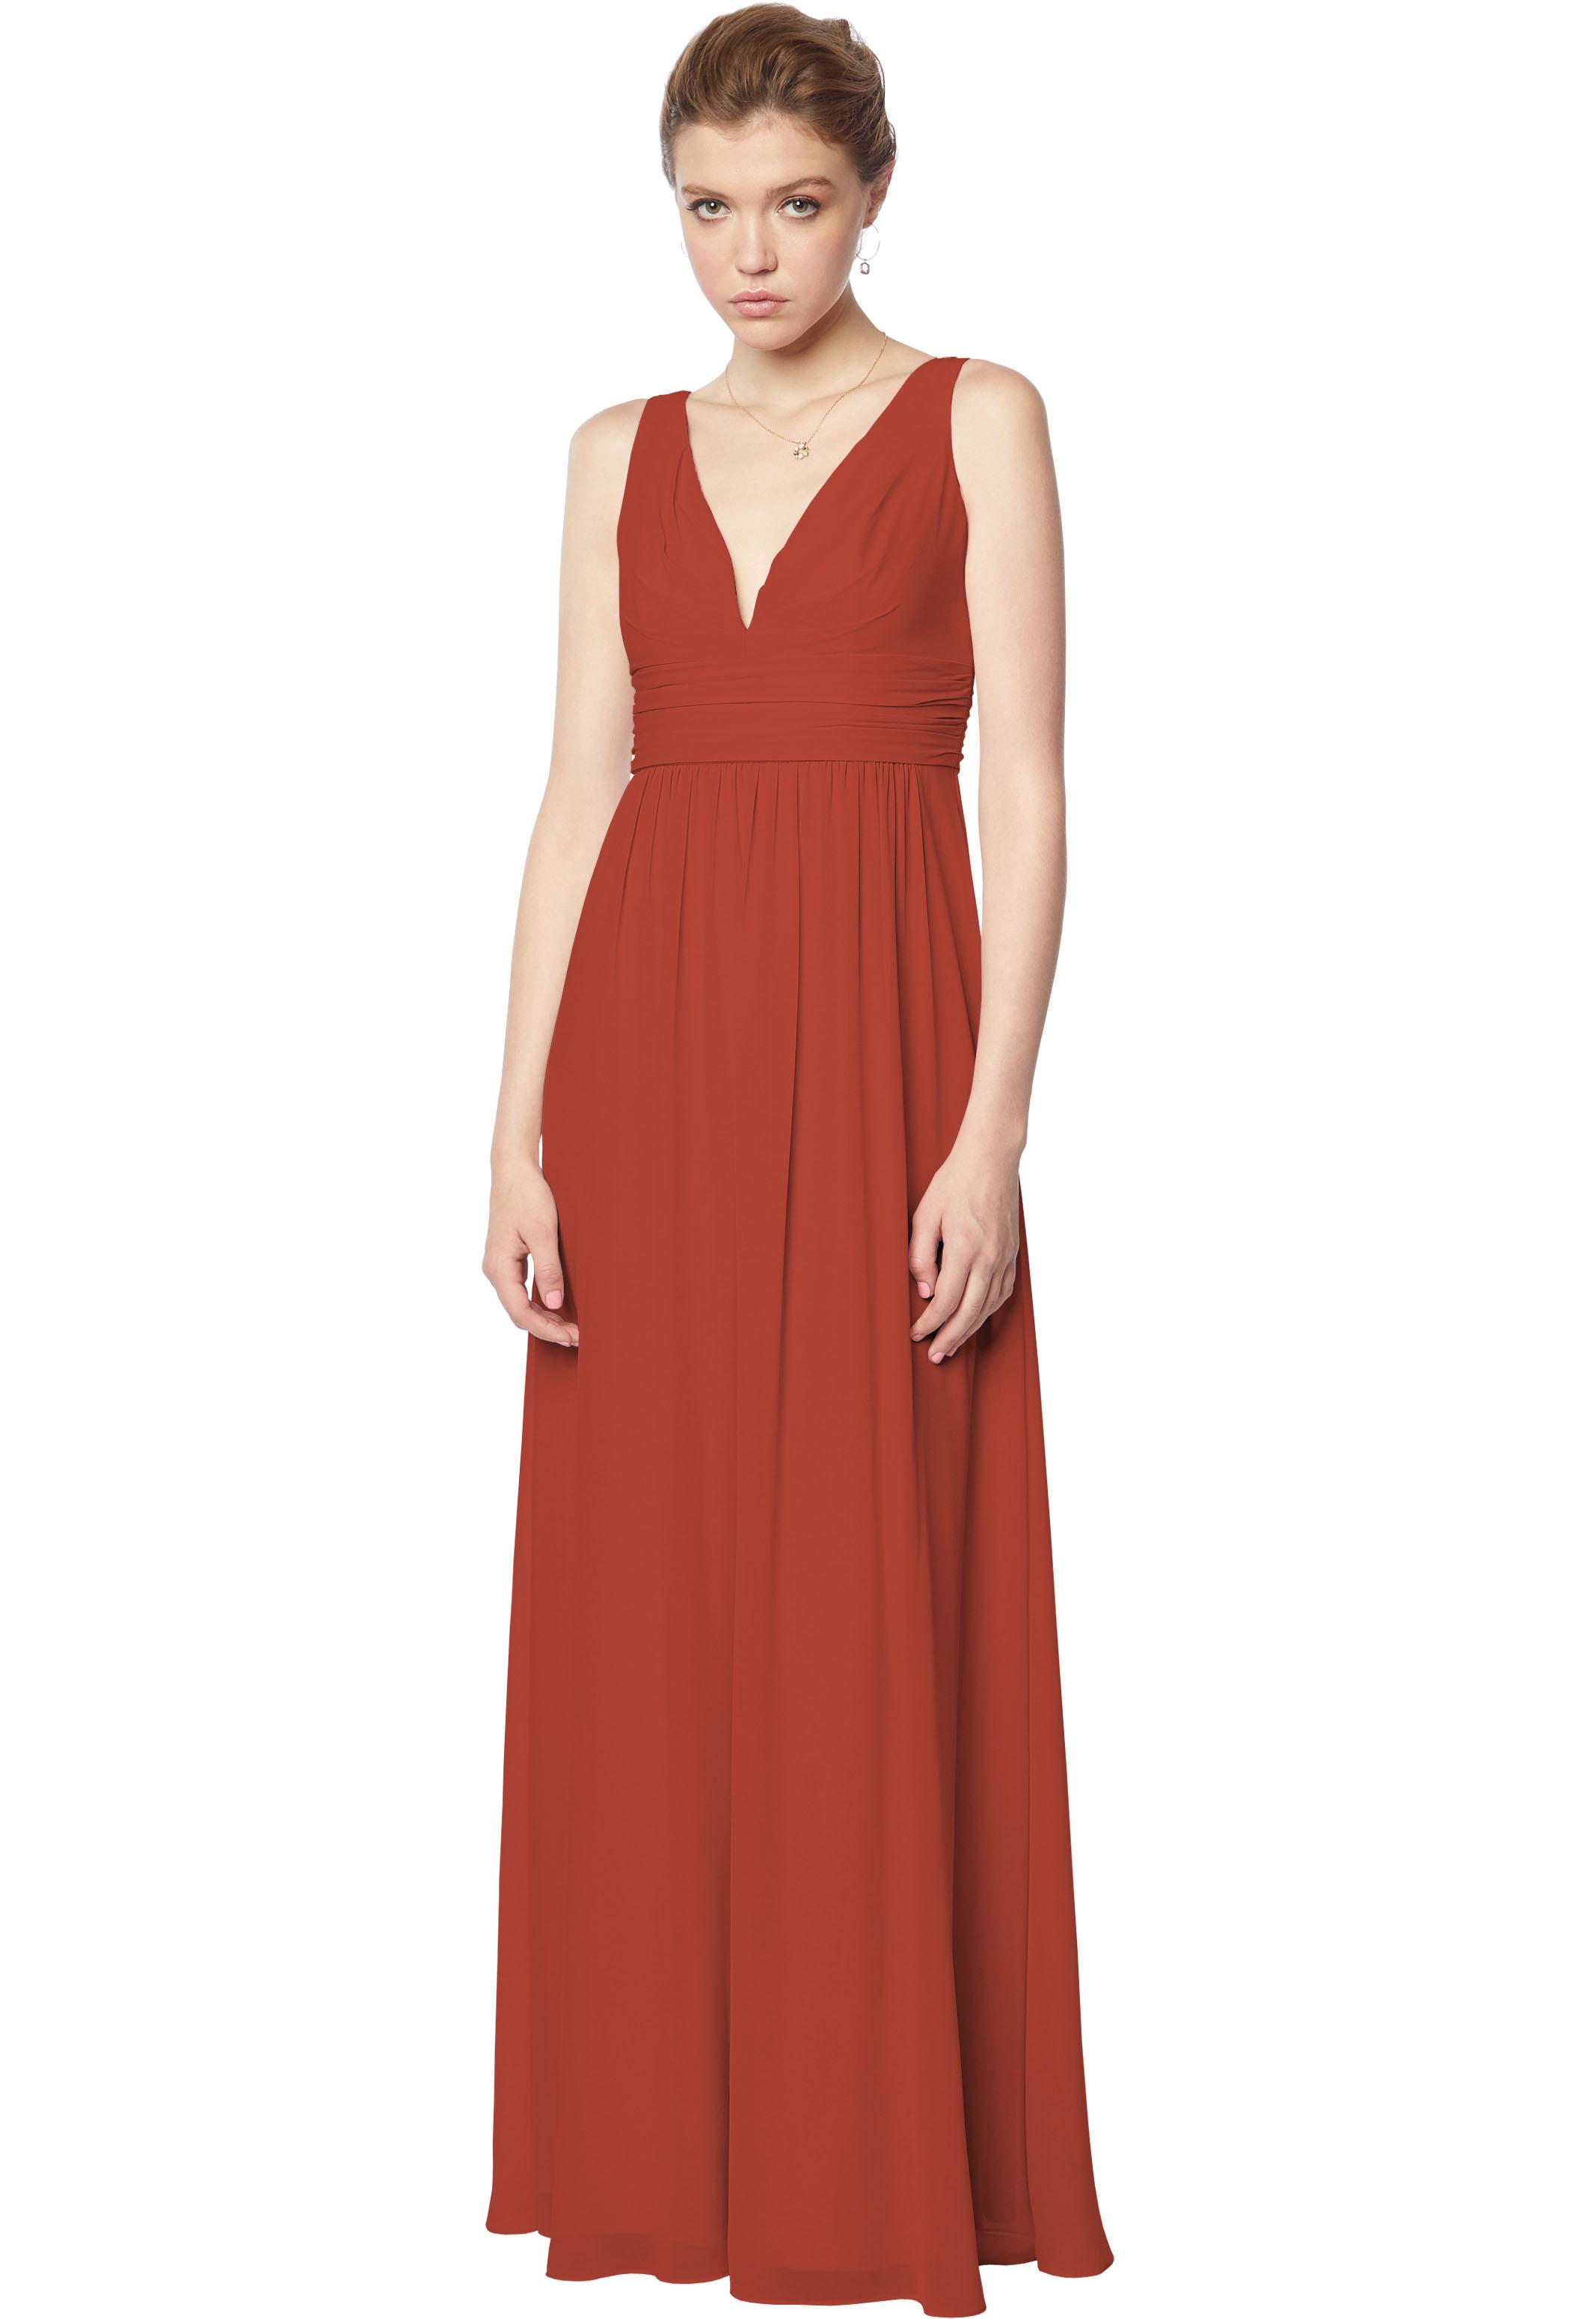 Bill Levkoff RUST Chiffon Sleeveless A-line gown, $170.00 Front